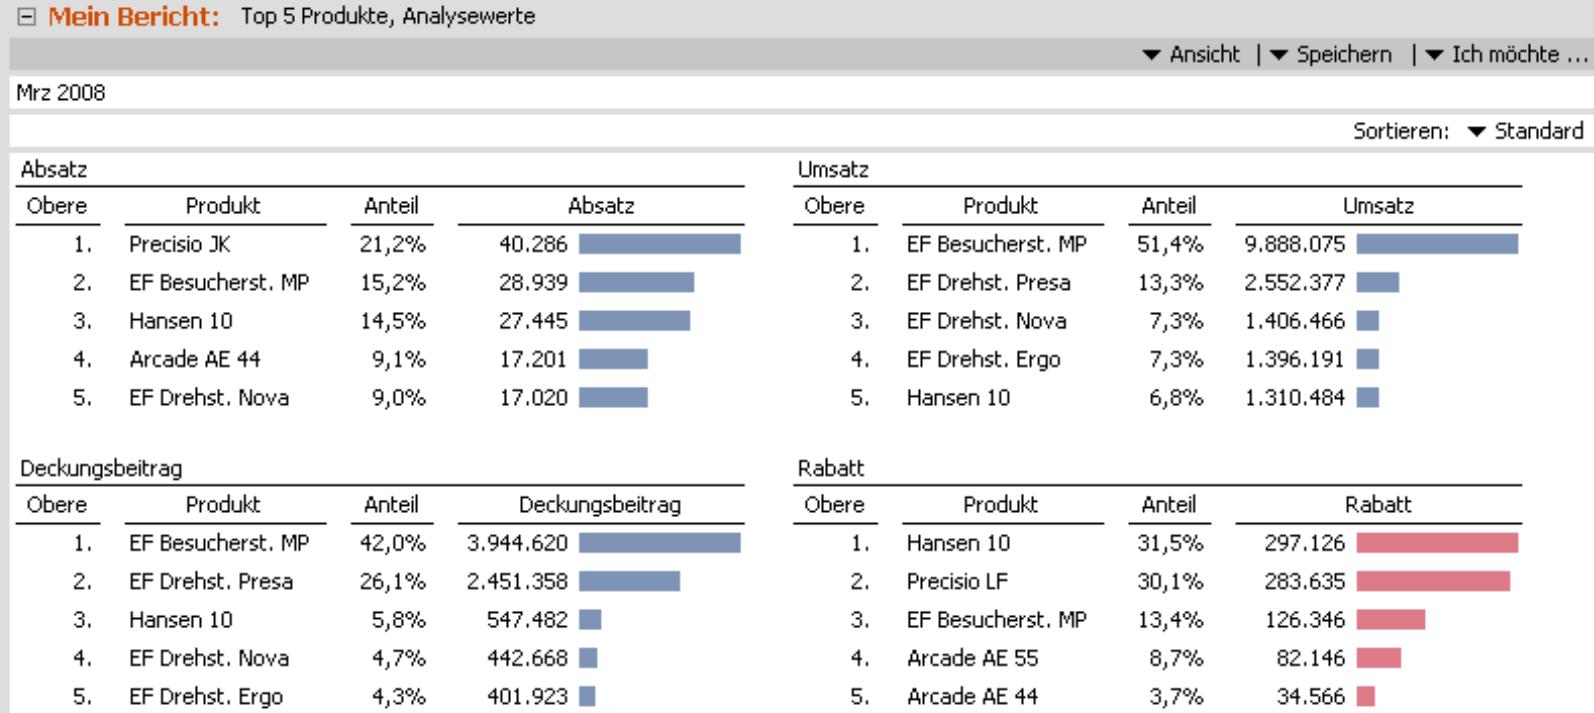 Bericht: Rangfolge; Iterationstyp: Analysewerte; Skalierung: global